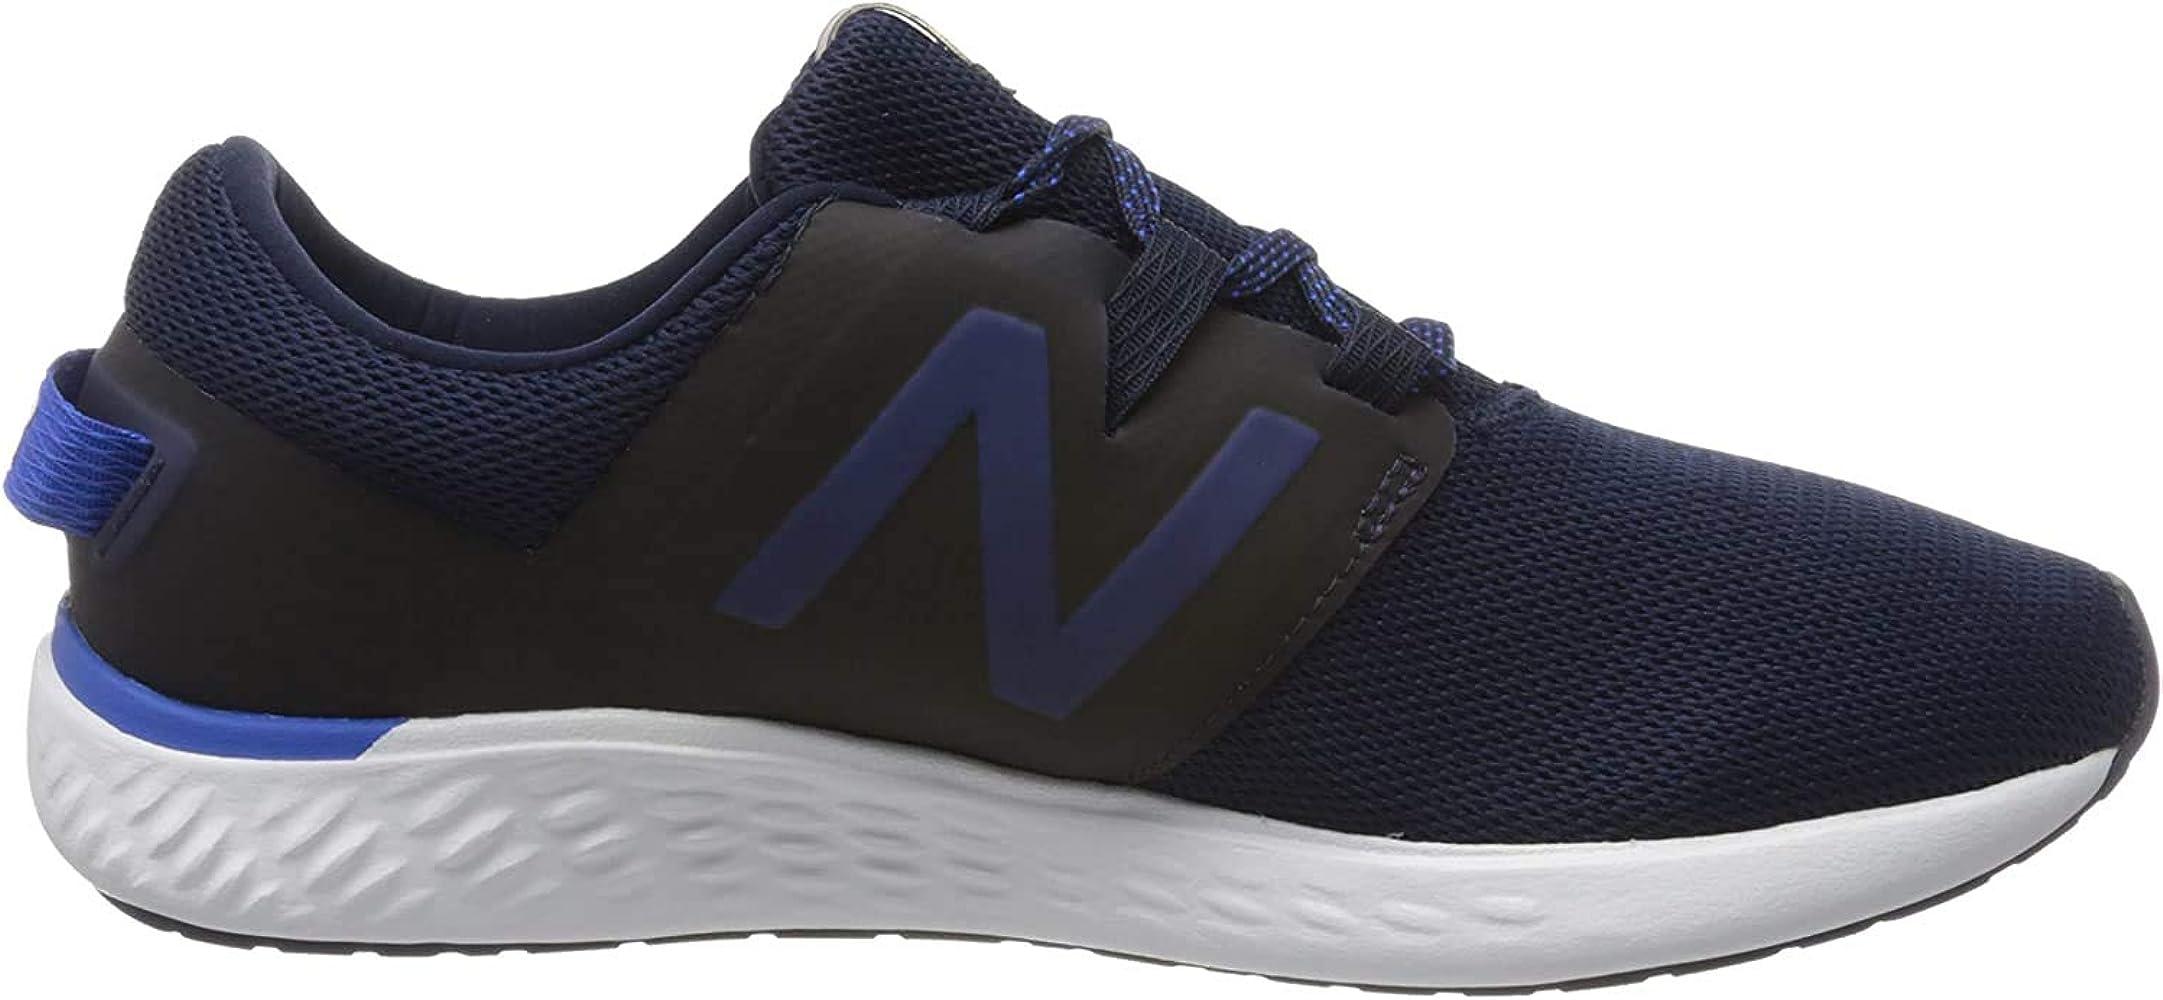 New Balance Fresh Foam Vero Racer h, Zapatillas de Running para Hombre, Azul (Navy Navy), 40 EU: Amazon.es: Zapatos y complementos